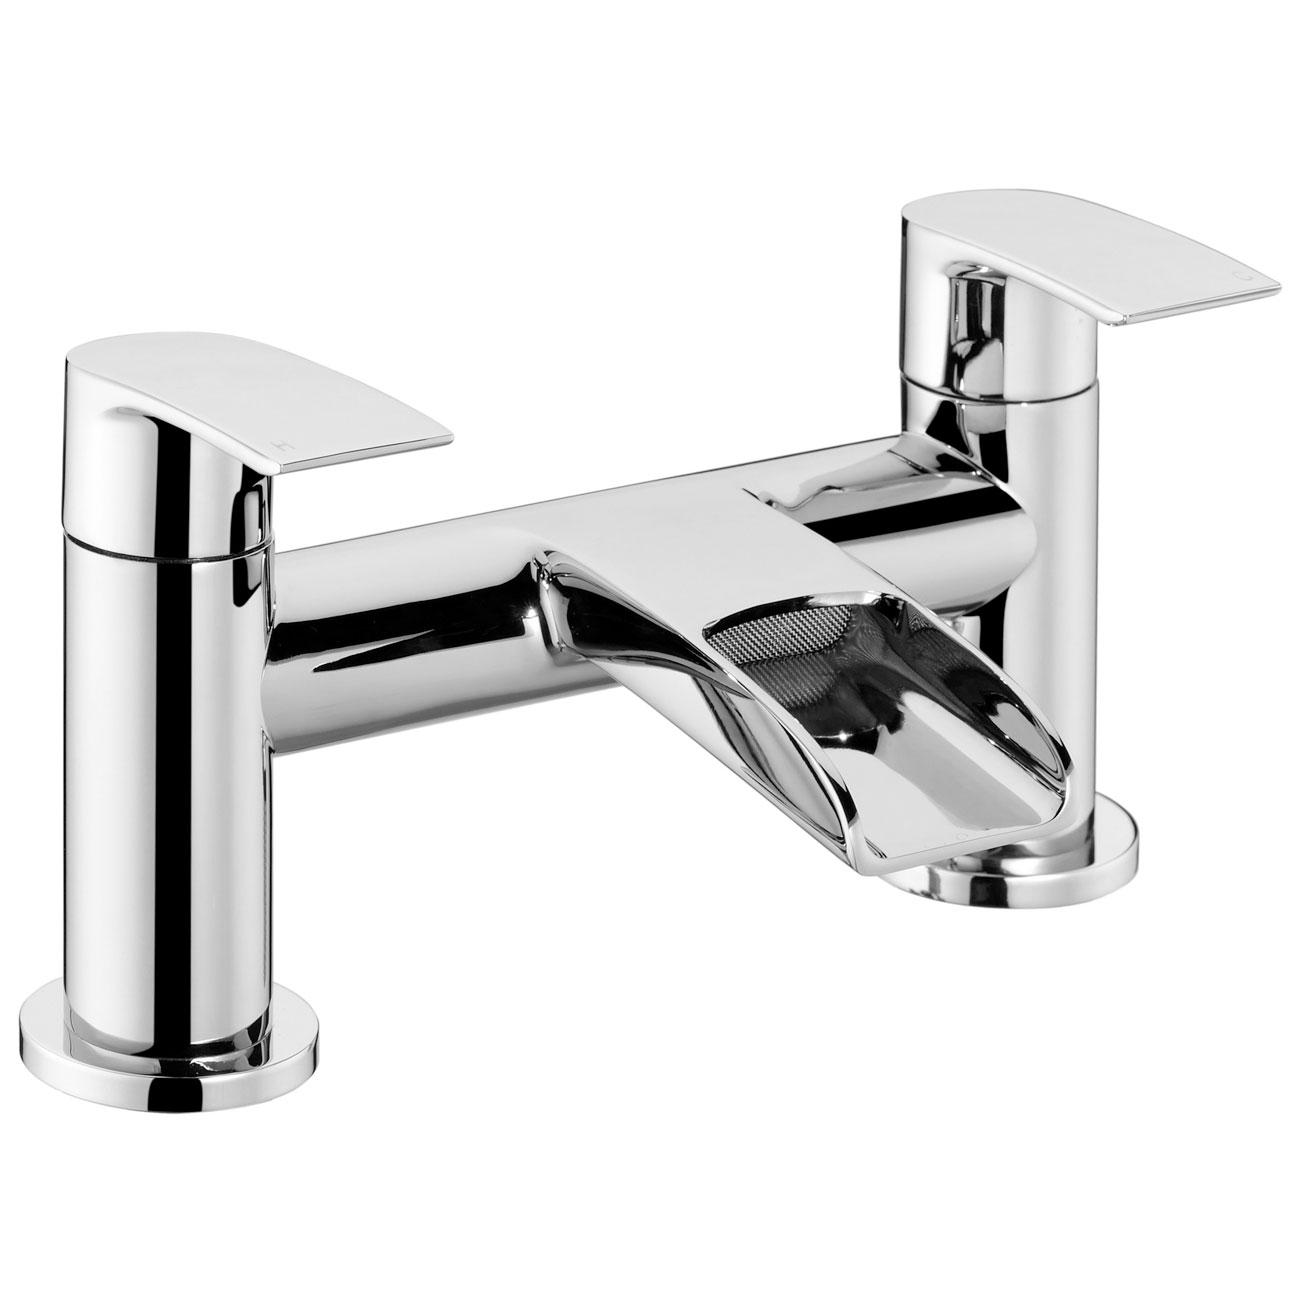 JTP Ravina Deck Mounted Bath Filler Tap - Chrome